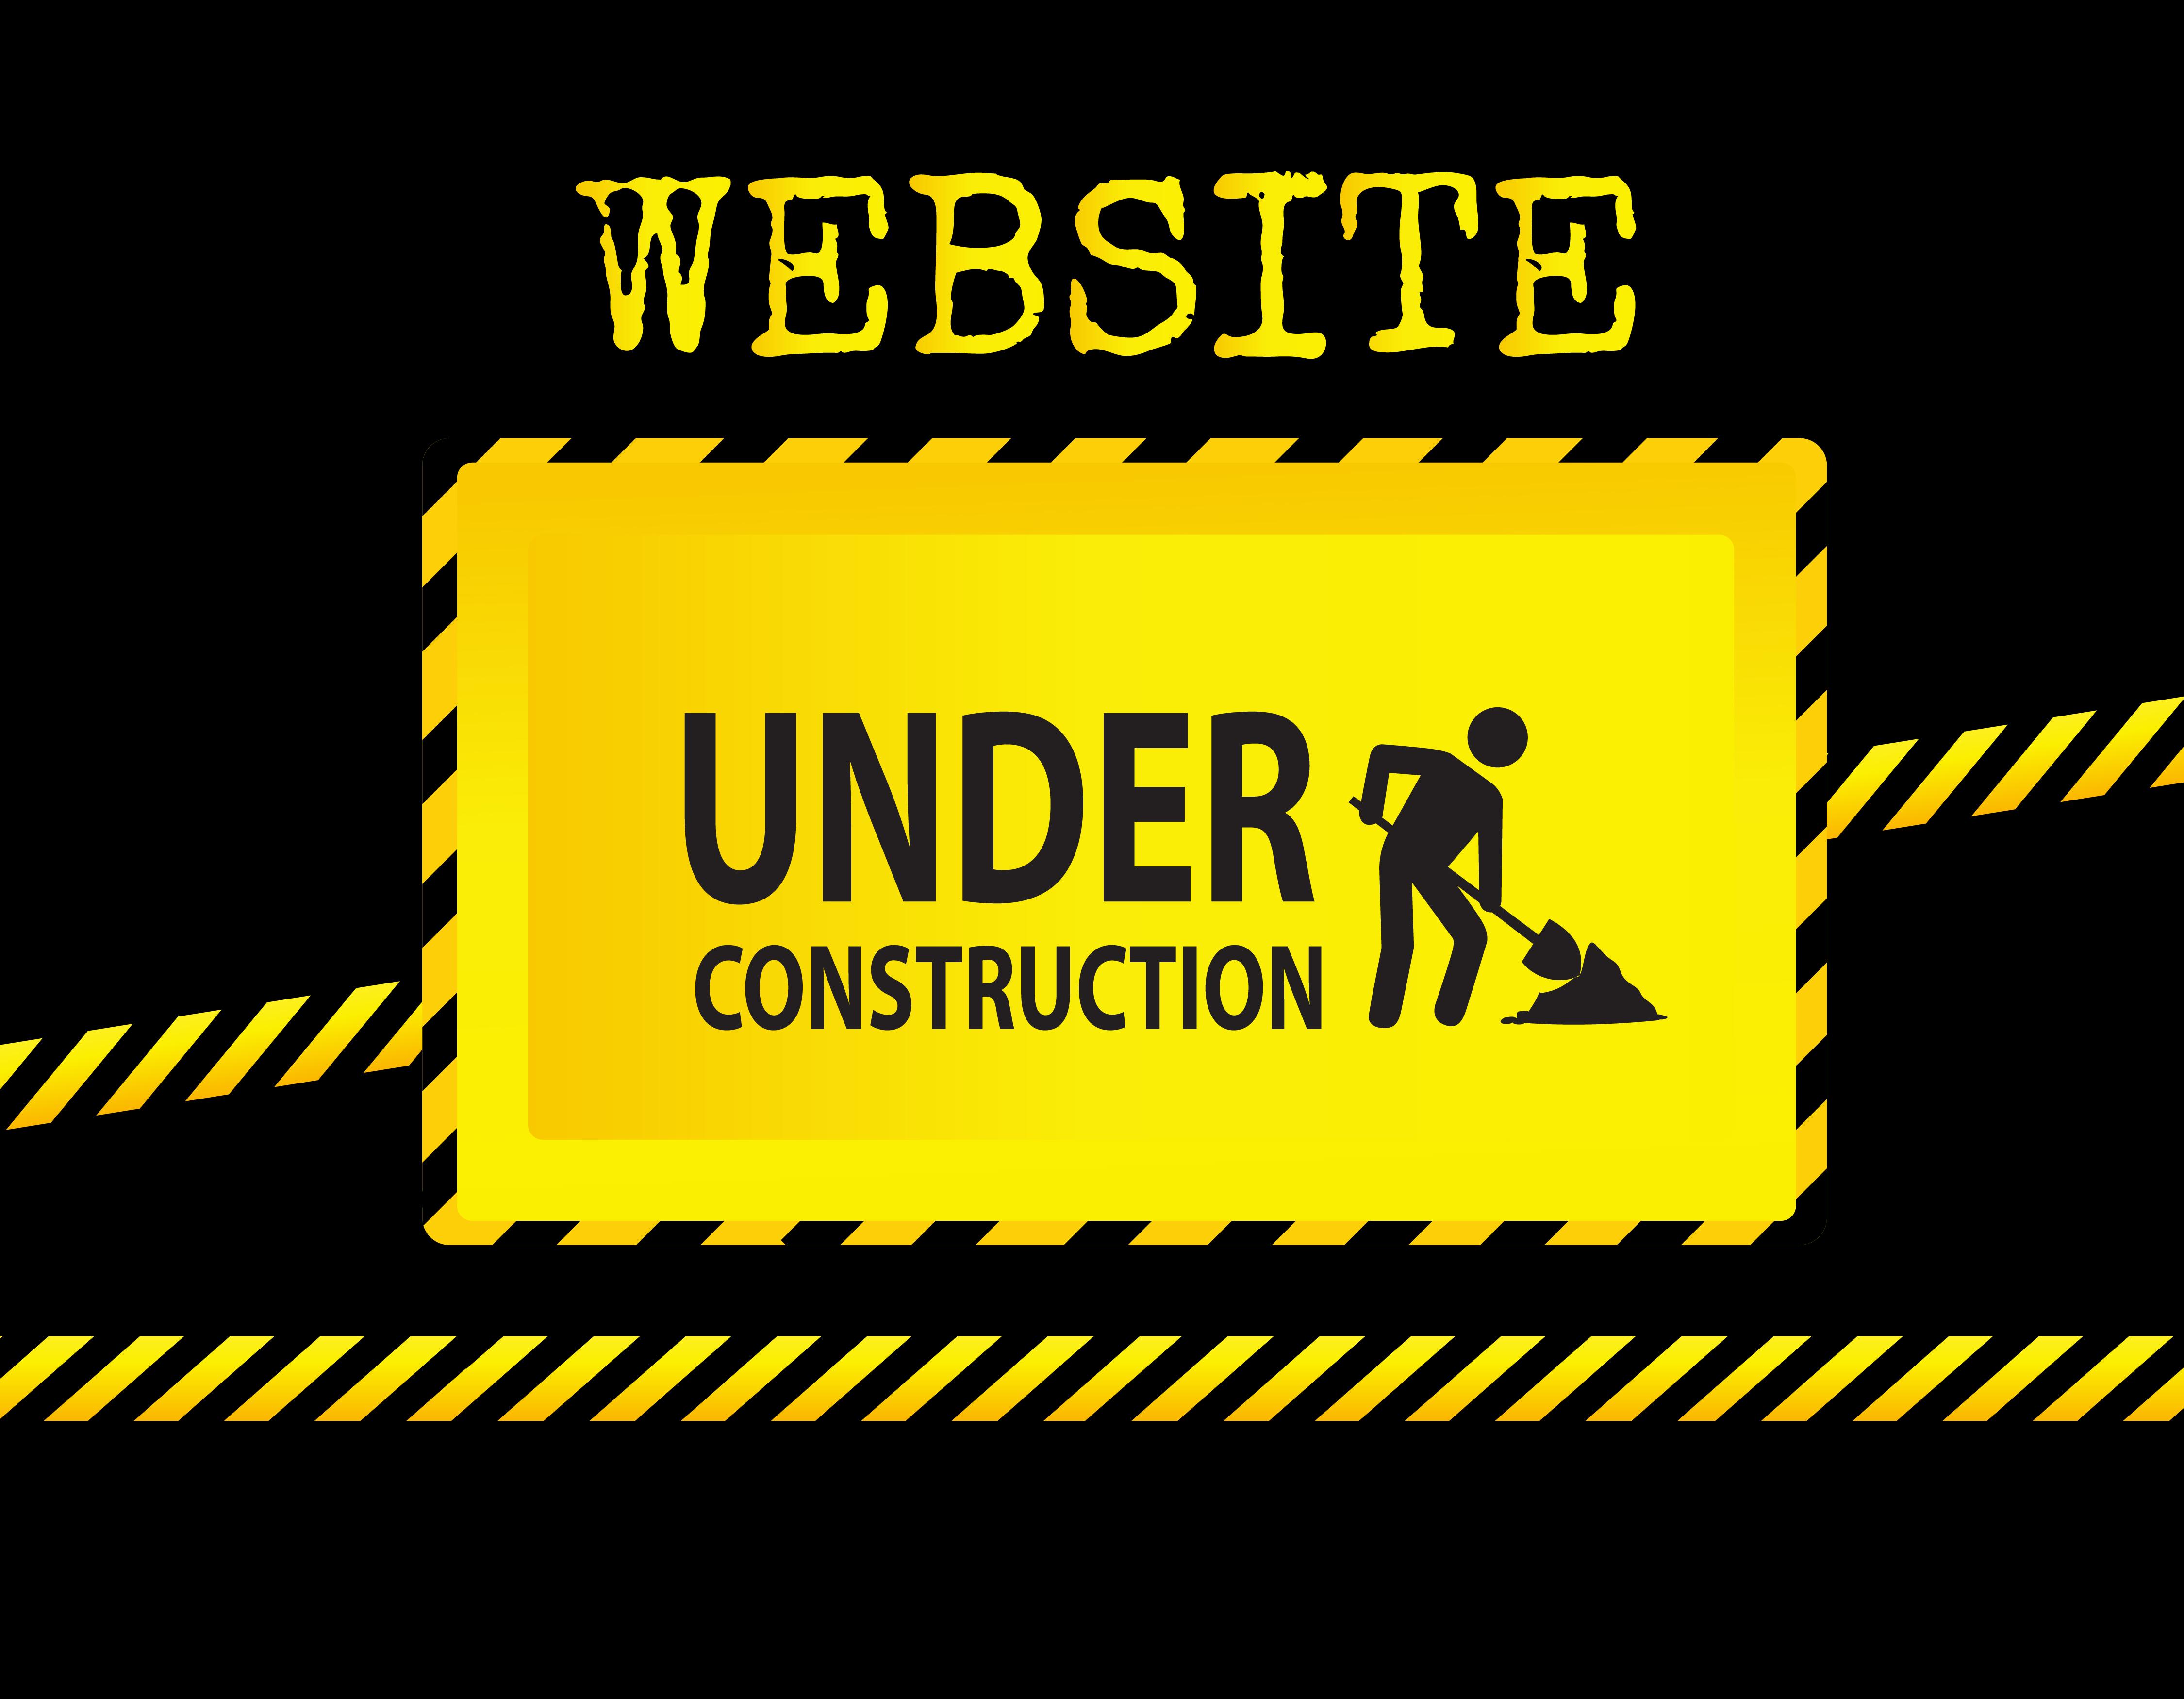 Illustration of website under construction sign or background for web site landing pages